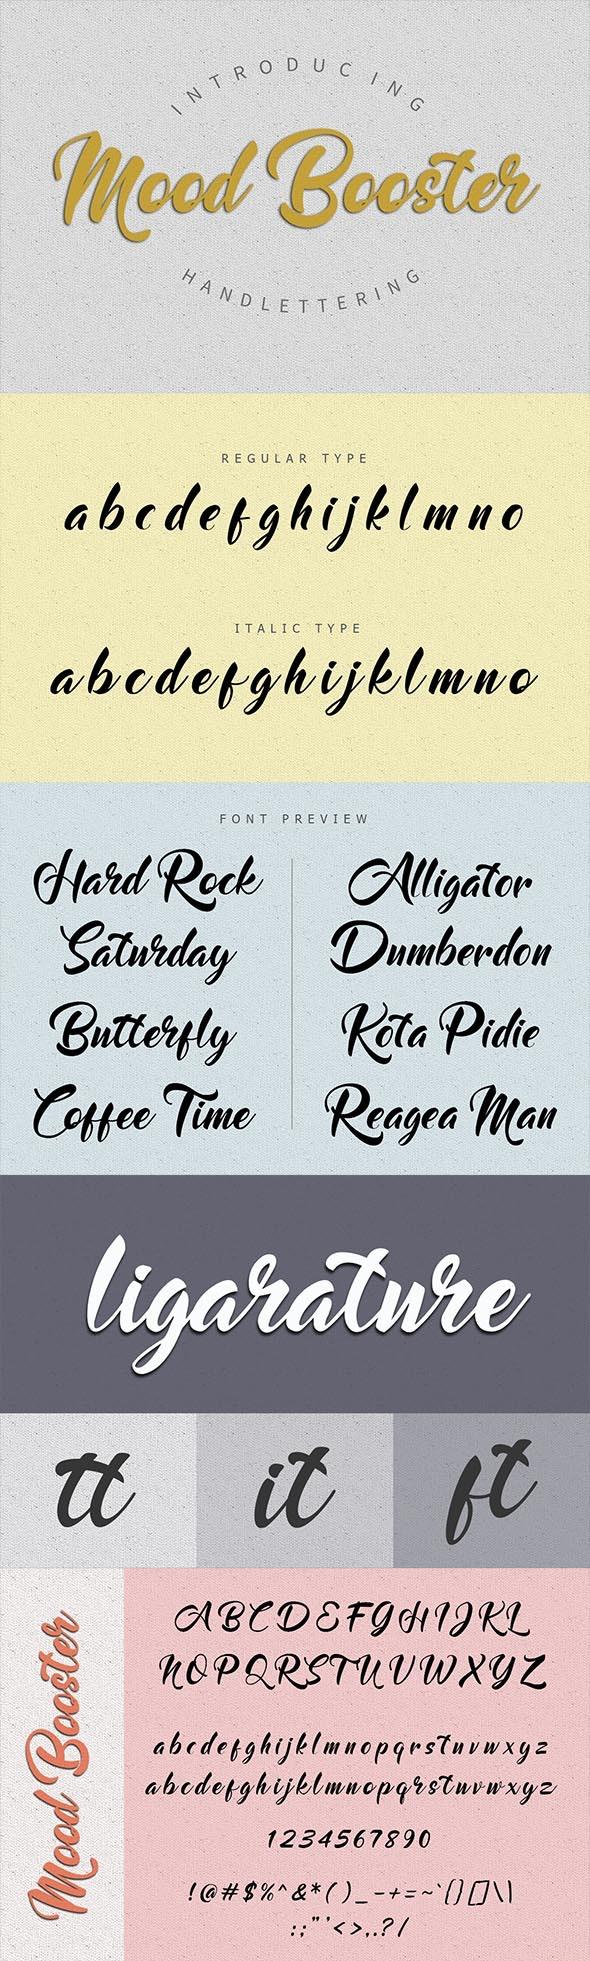 Mood Booster Font - Calligraphy Script